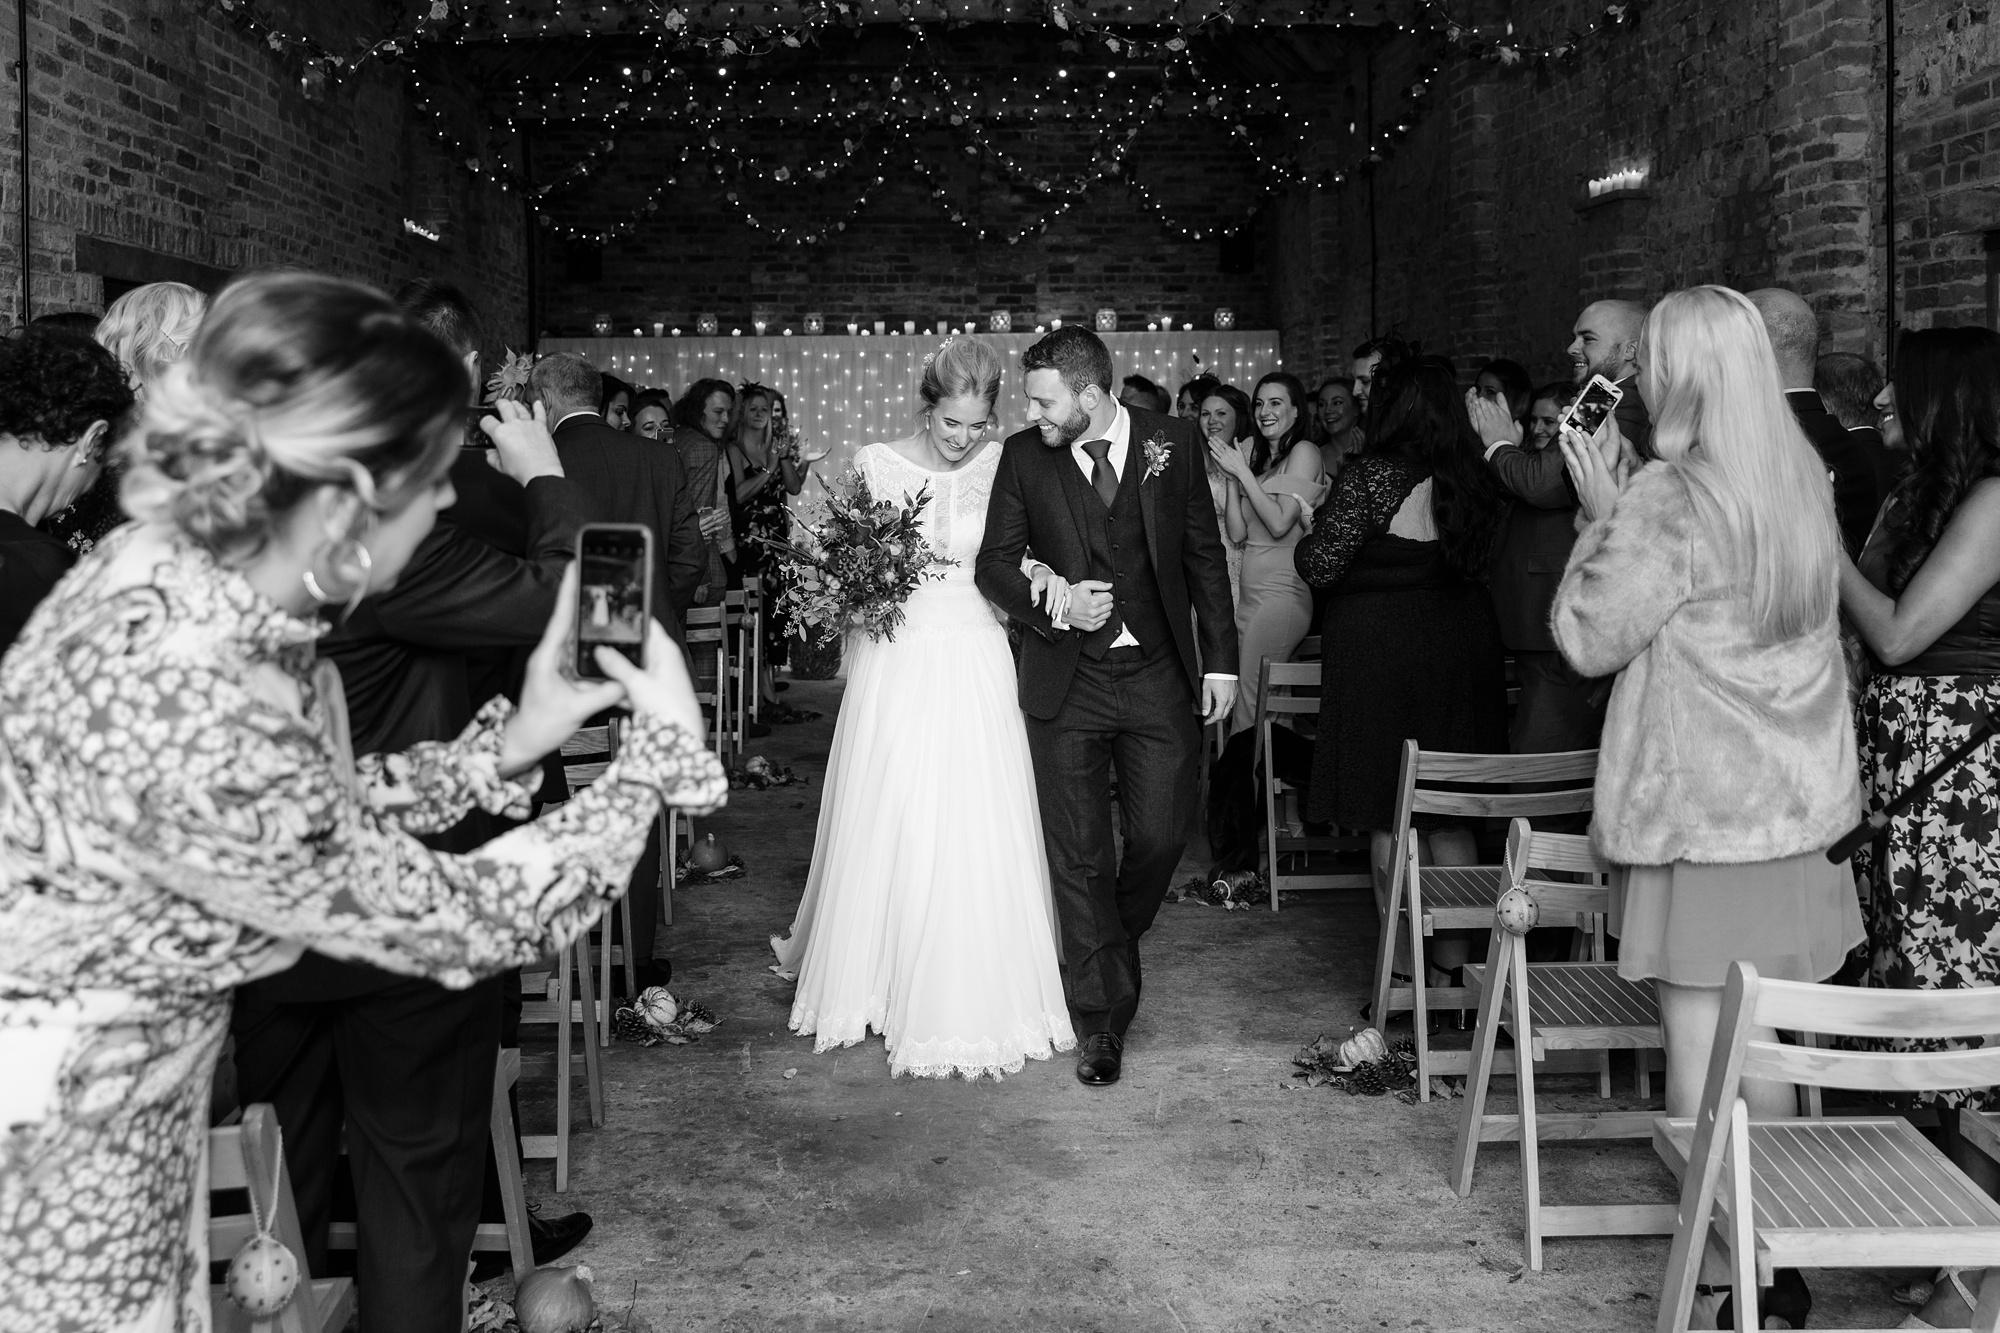 Yorkshire Wedding Photographers at Barmbyfield Barn walking back up the aisle